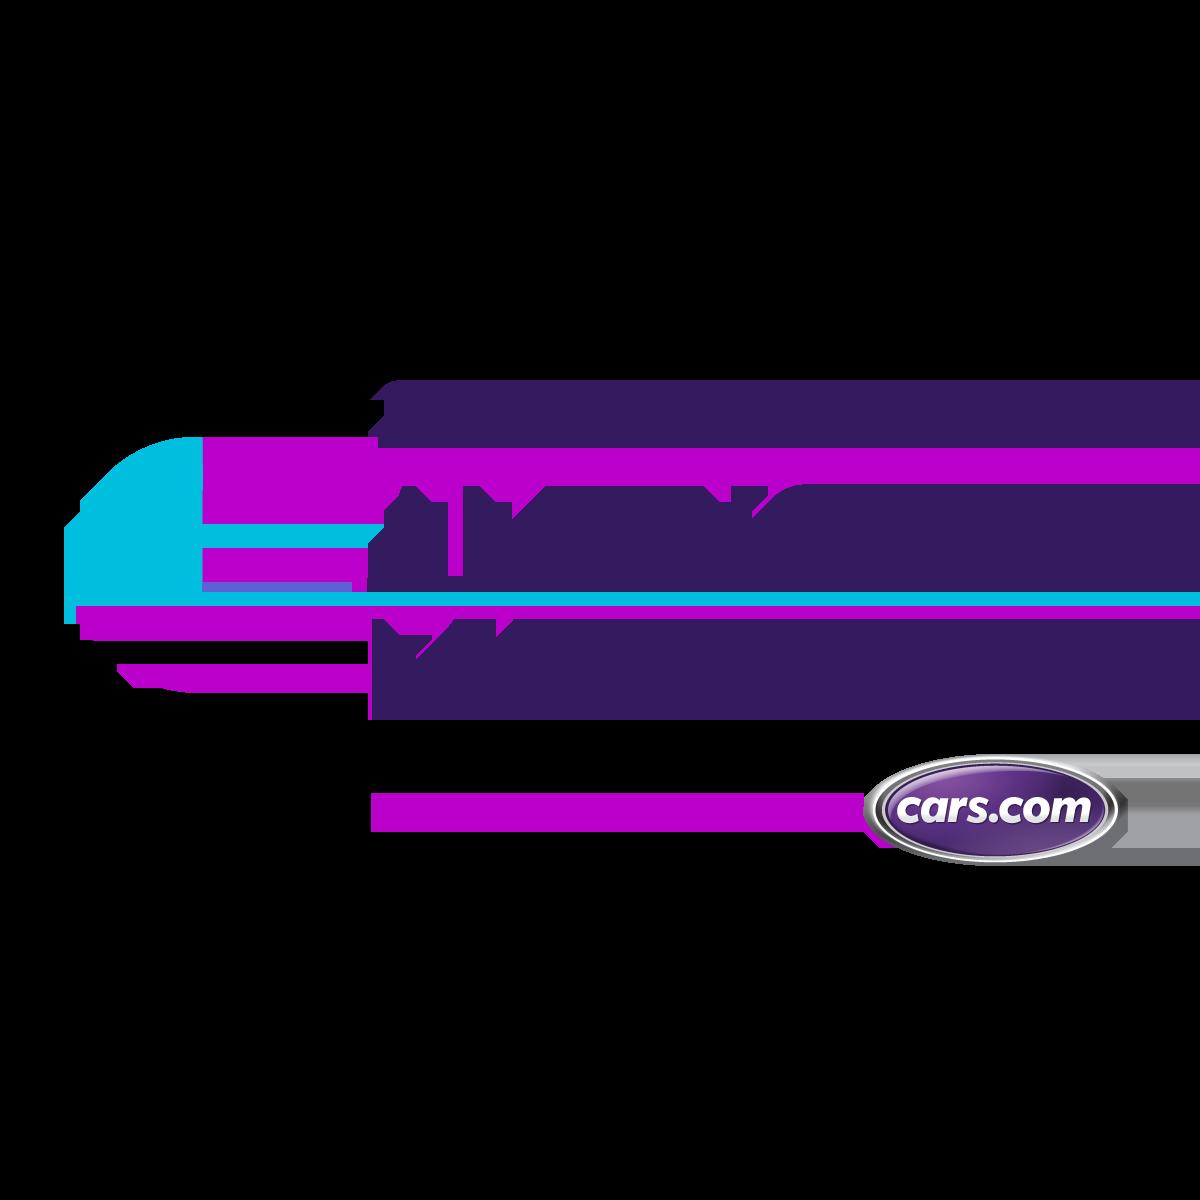 Cars.com 2021 American-Made Index